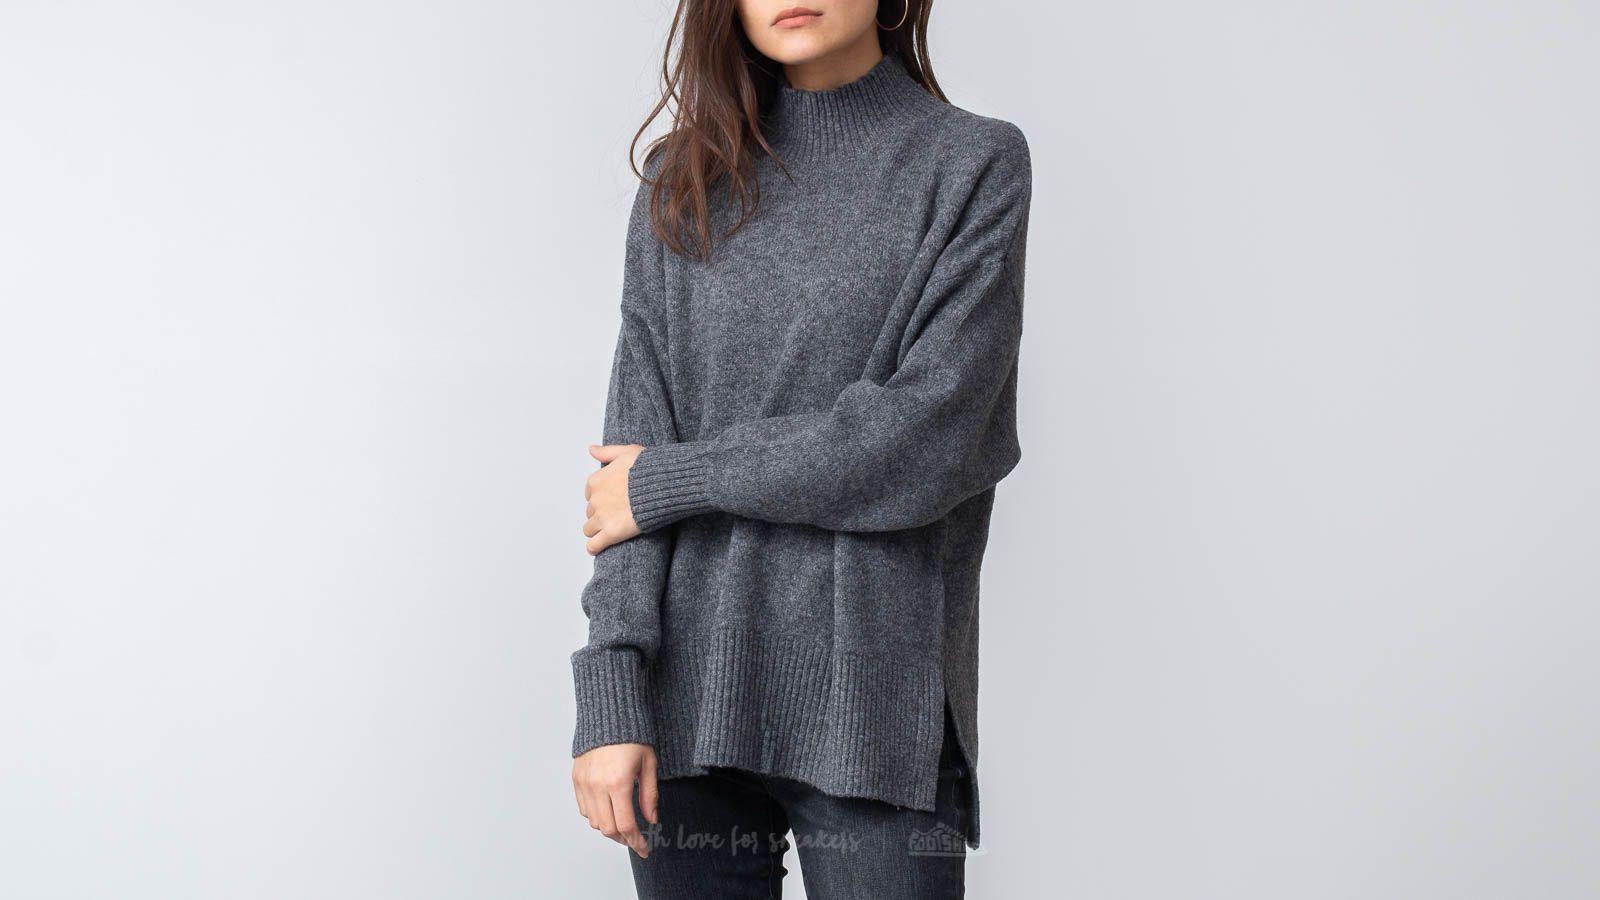 SELECTED Lara Longsleeve Knit Highneck Pullover Medium Grey Melange za skvělou cenu 770 Kč koupíte na Footshop.cz